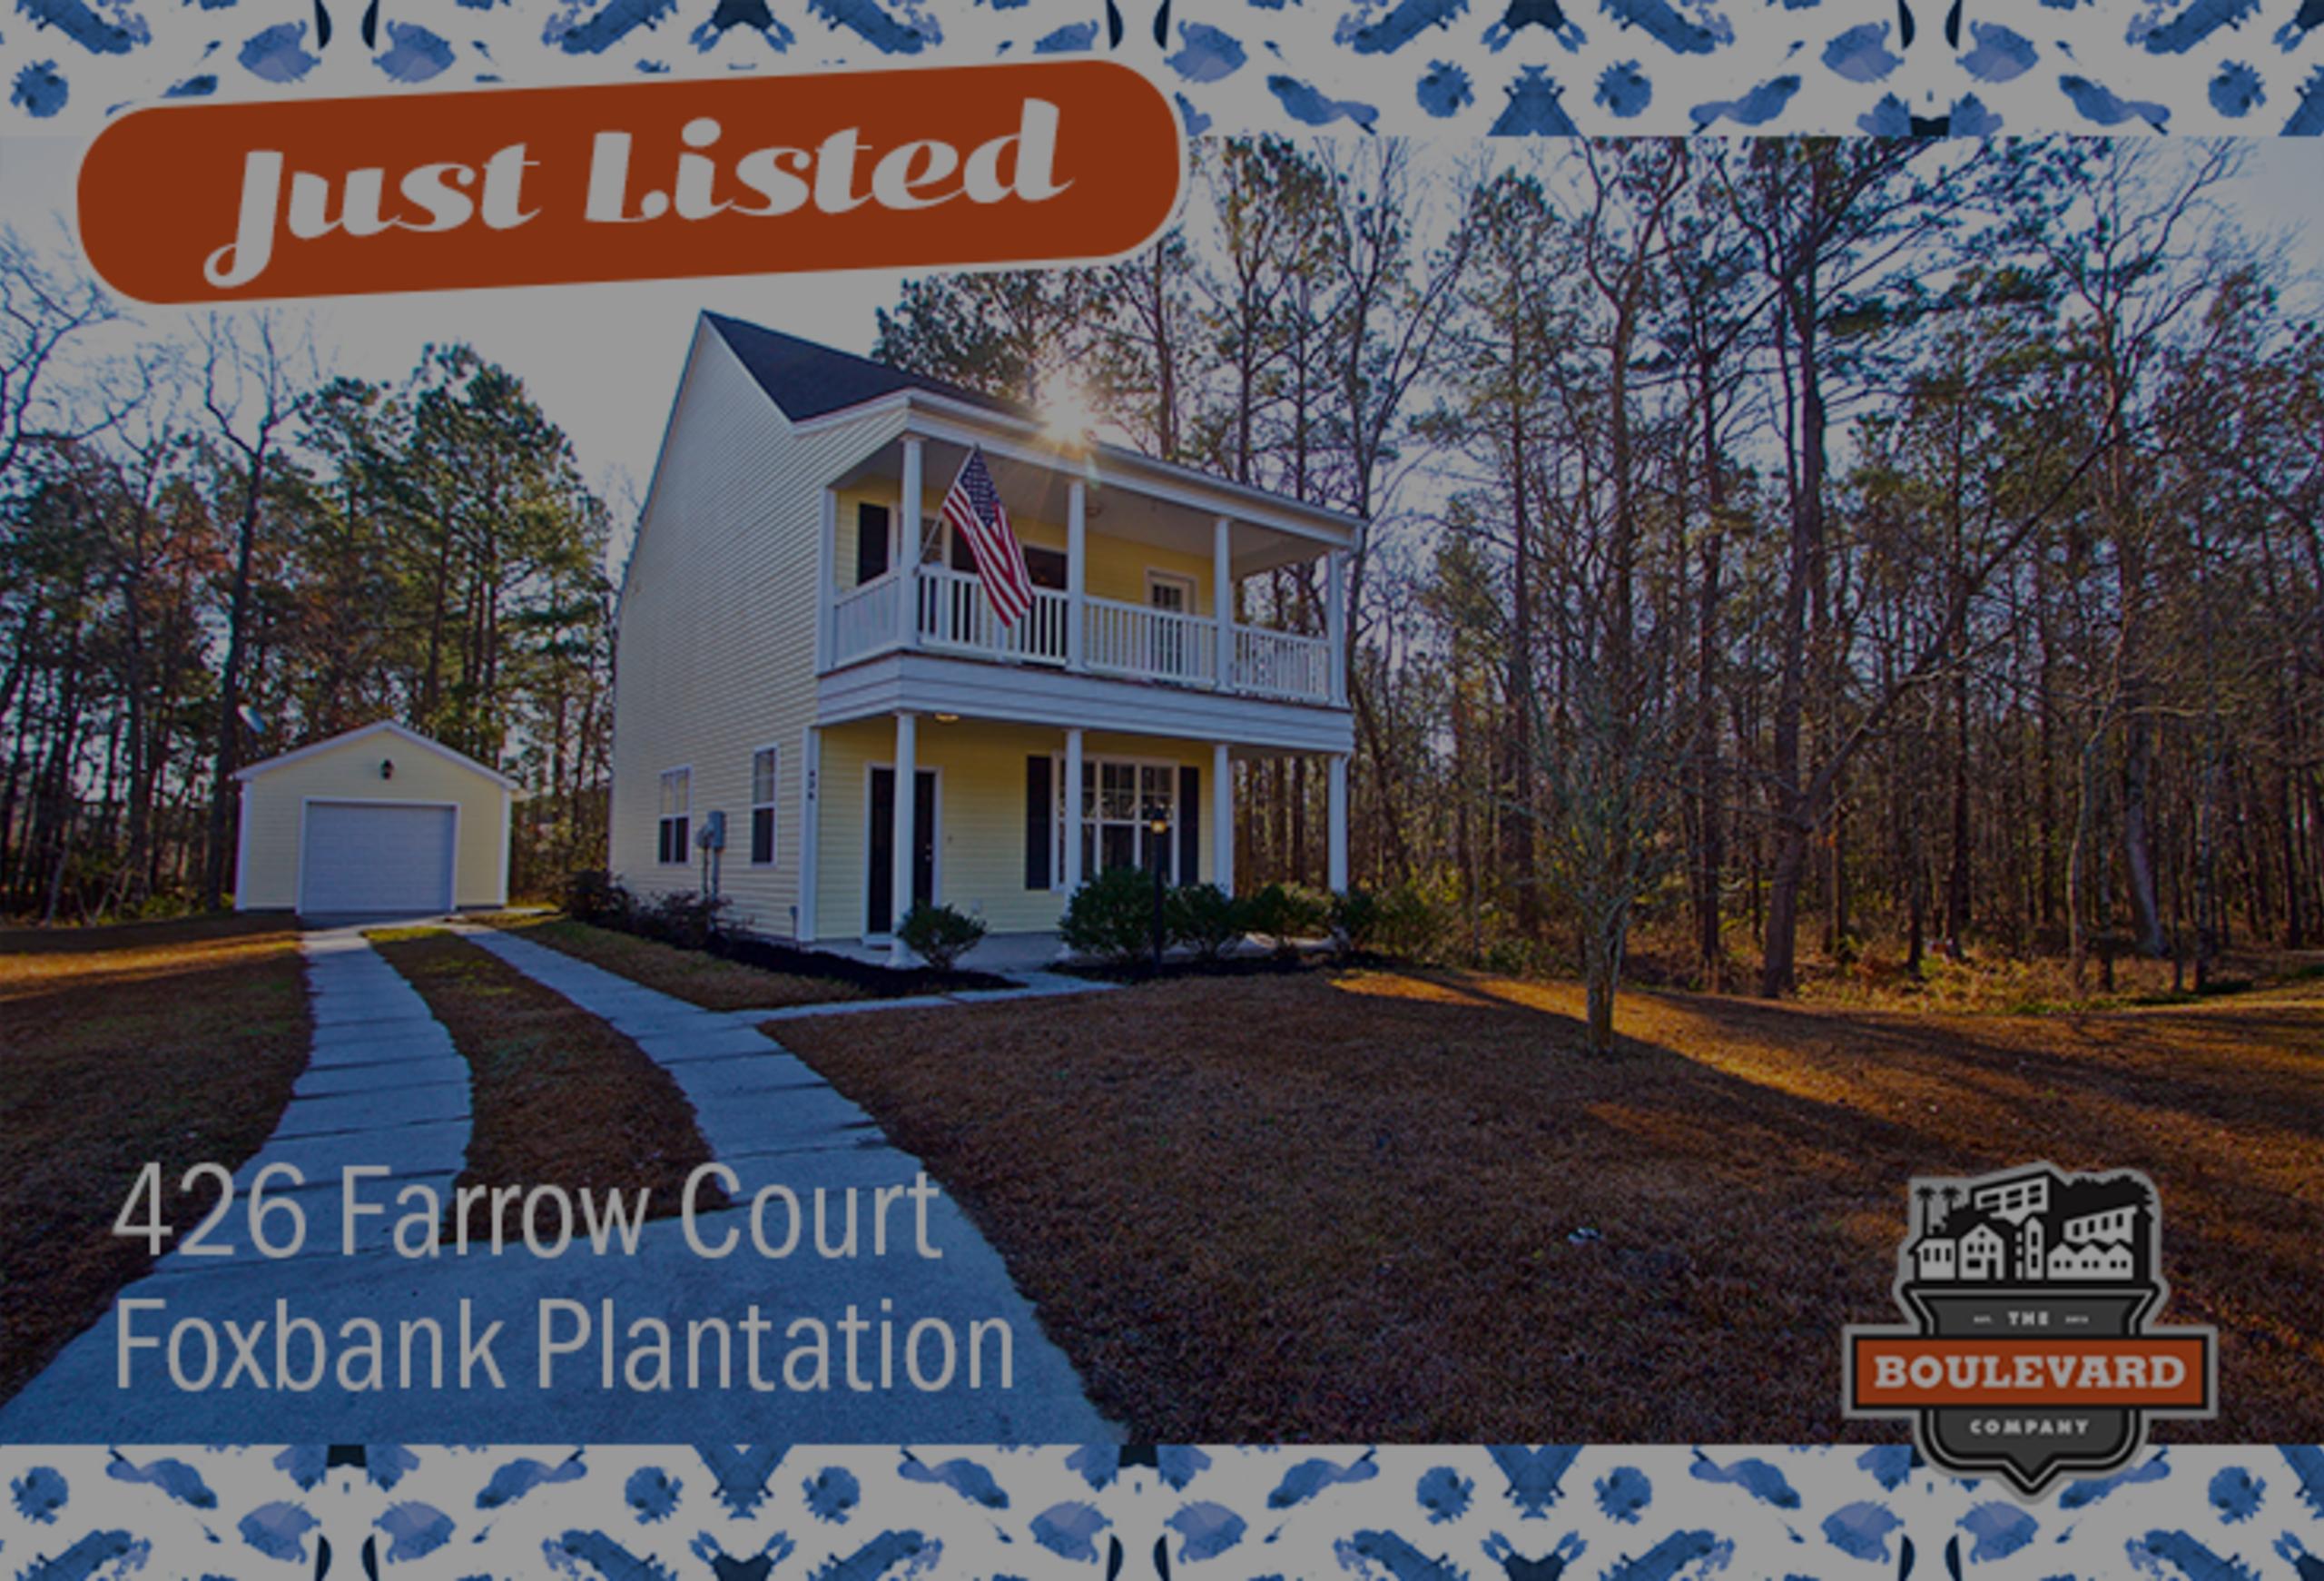 new listing: 426 Farrow Court in Foxbank Plantation